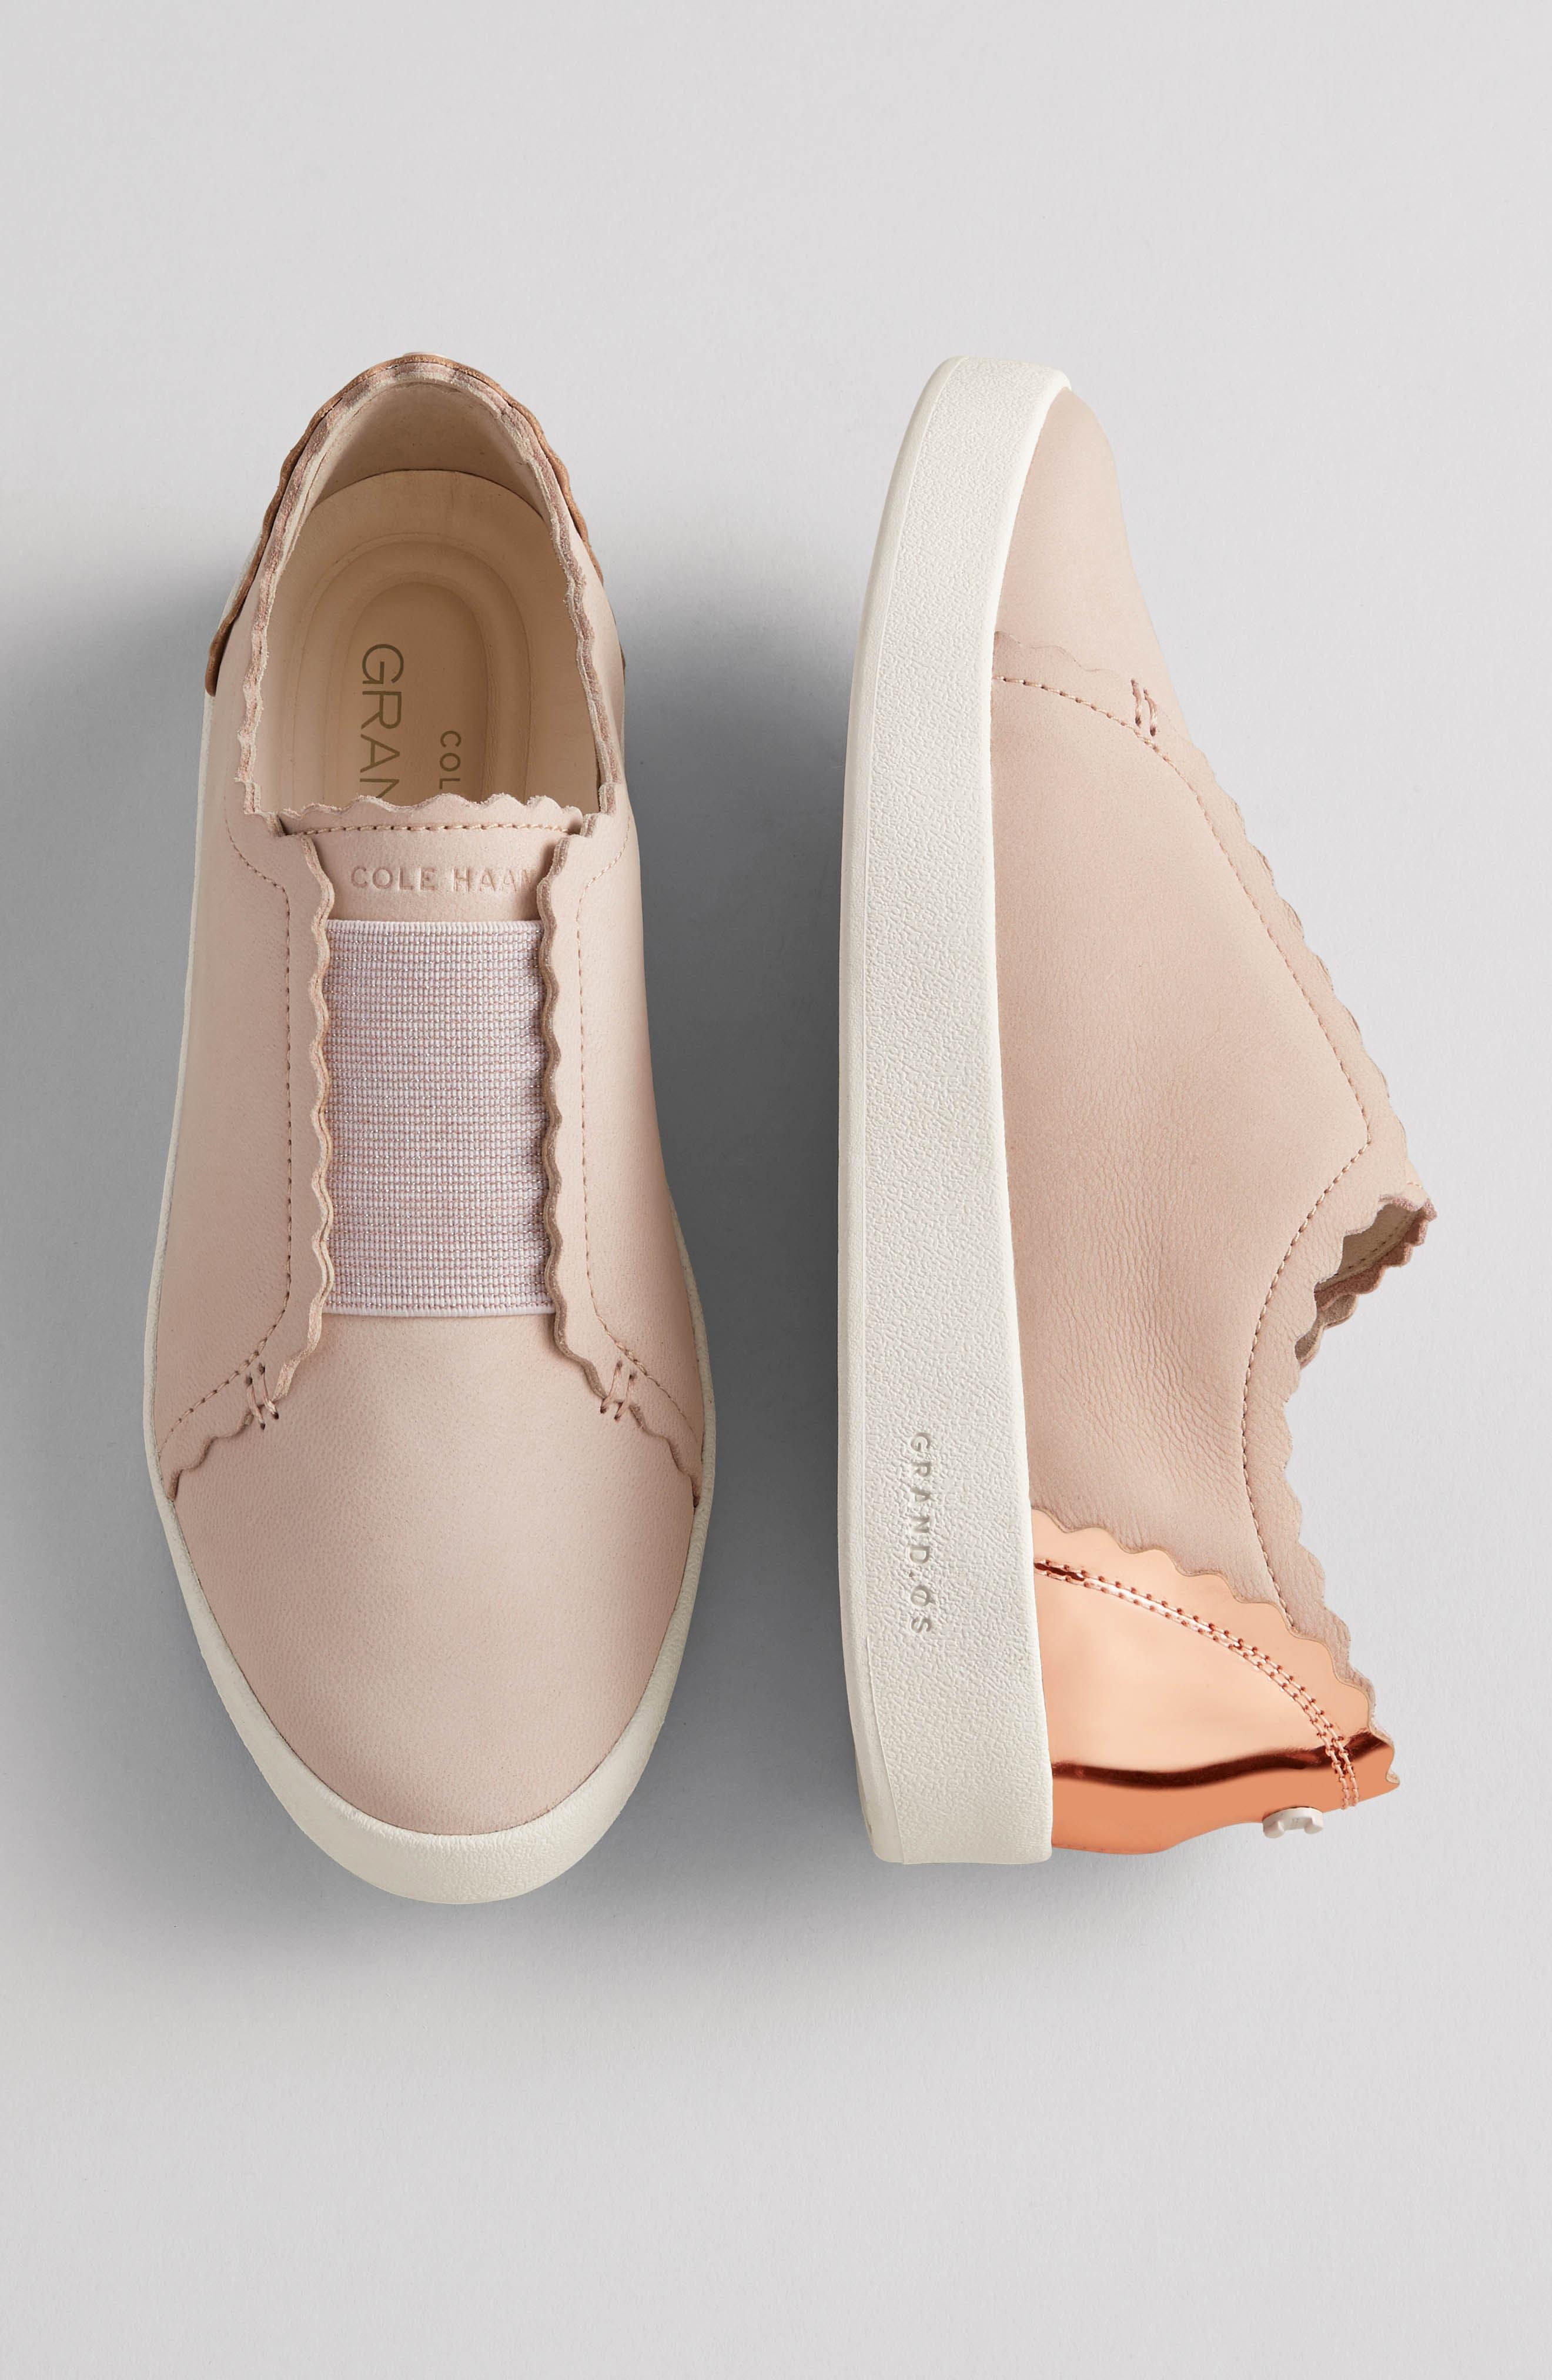 COLE HAAN, GrandPro Spectator Scalloped Slip-On Sneaker, Alternate thumbnail 7, color, PEACH BLUSH NUBUCK